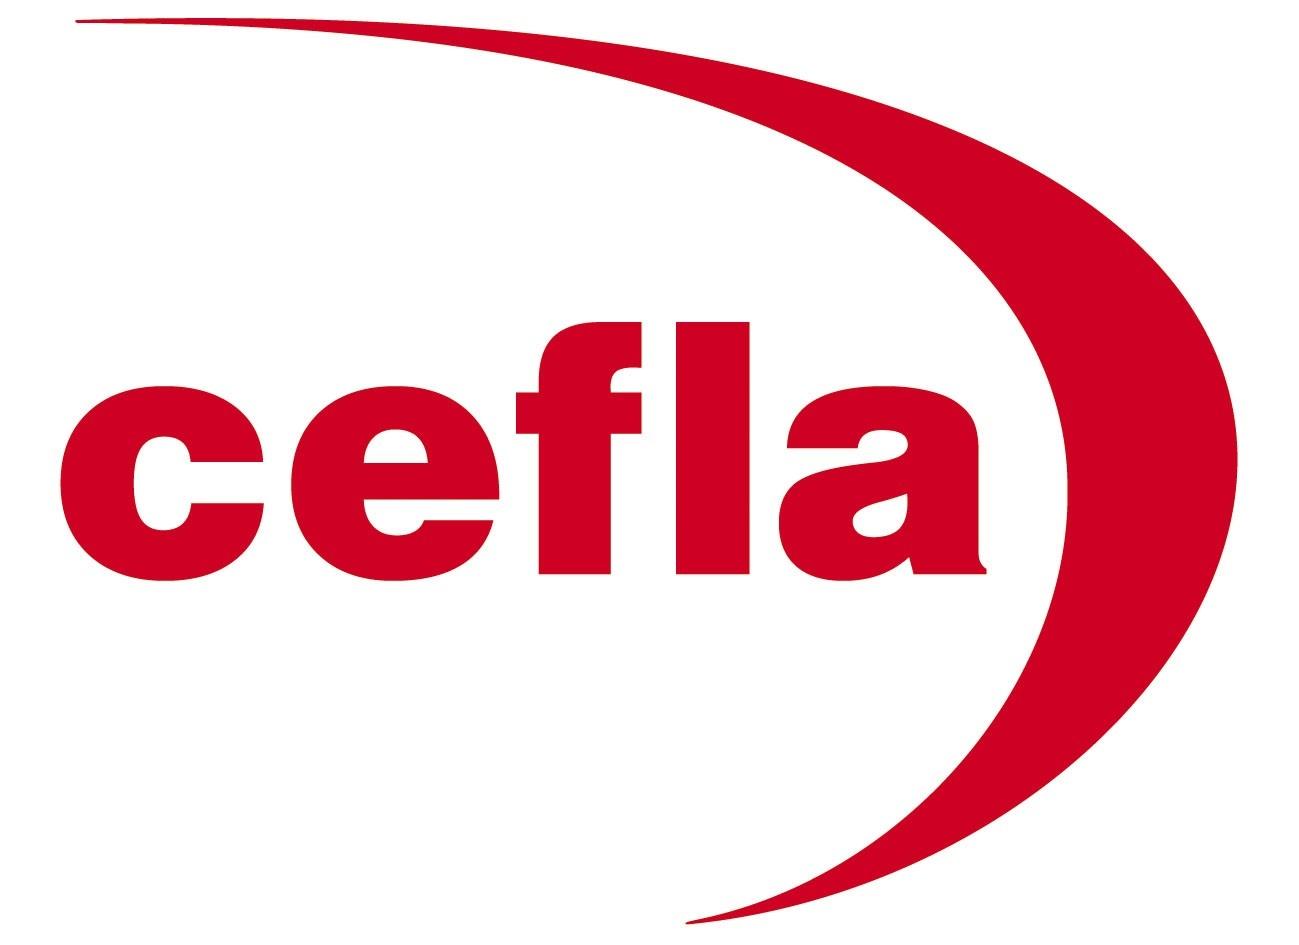 cefla logo jpeg